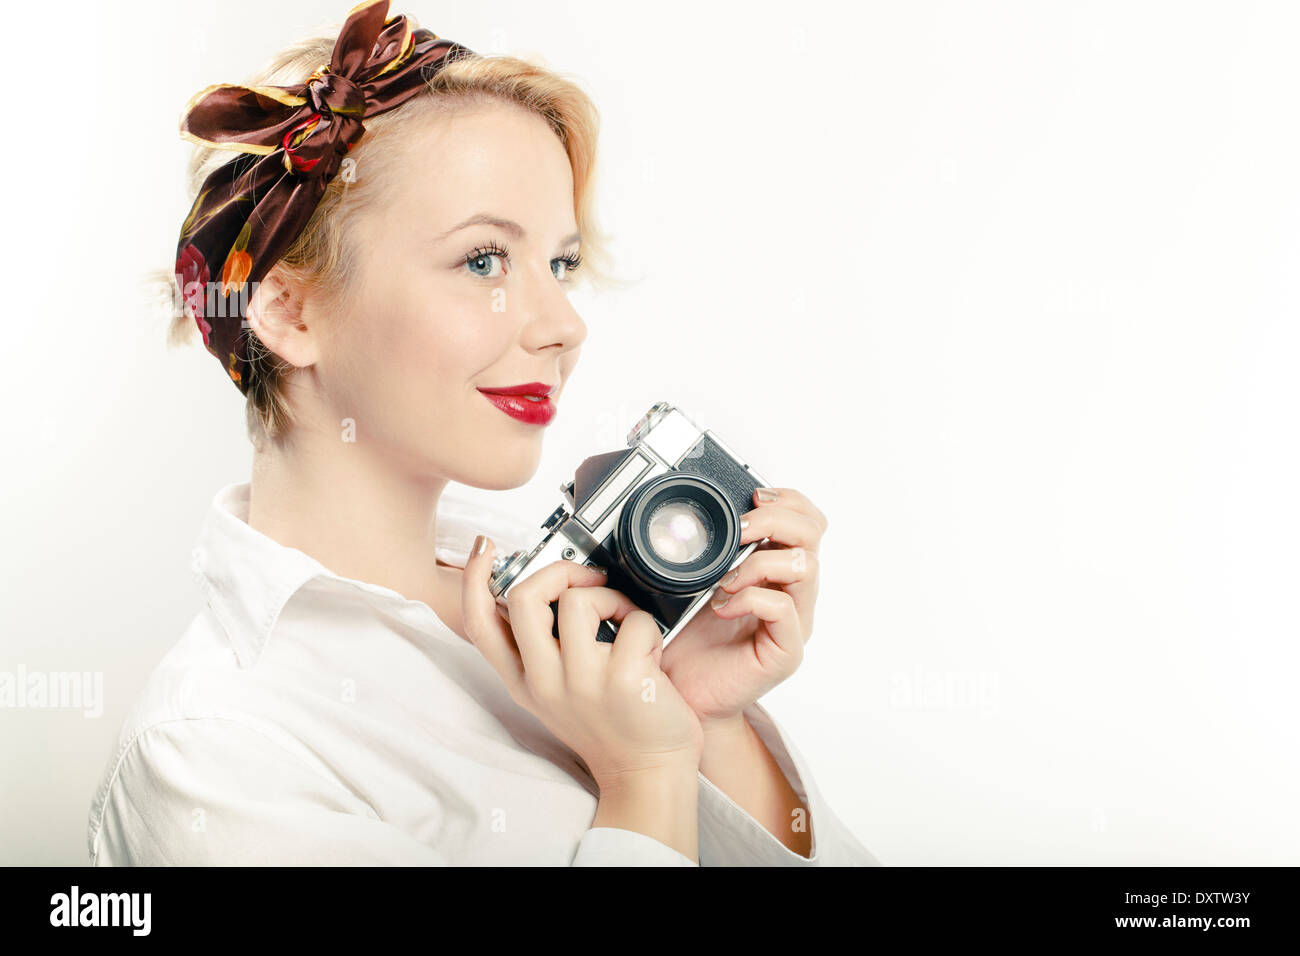 Junge Frau mit Fotokamera, Porträt Stockbild